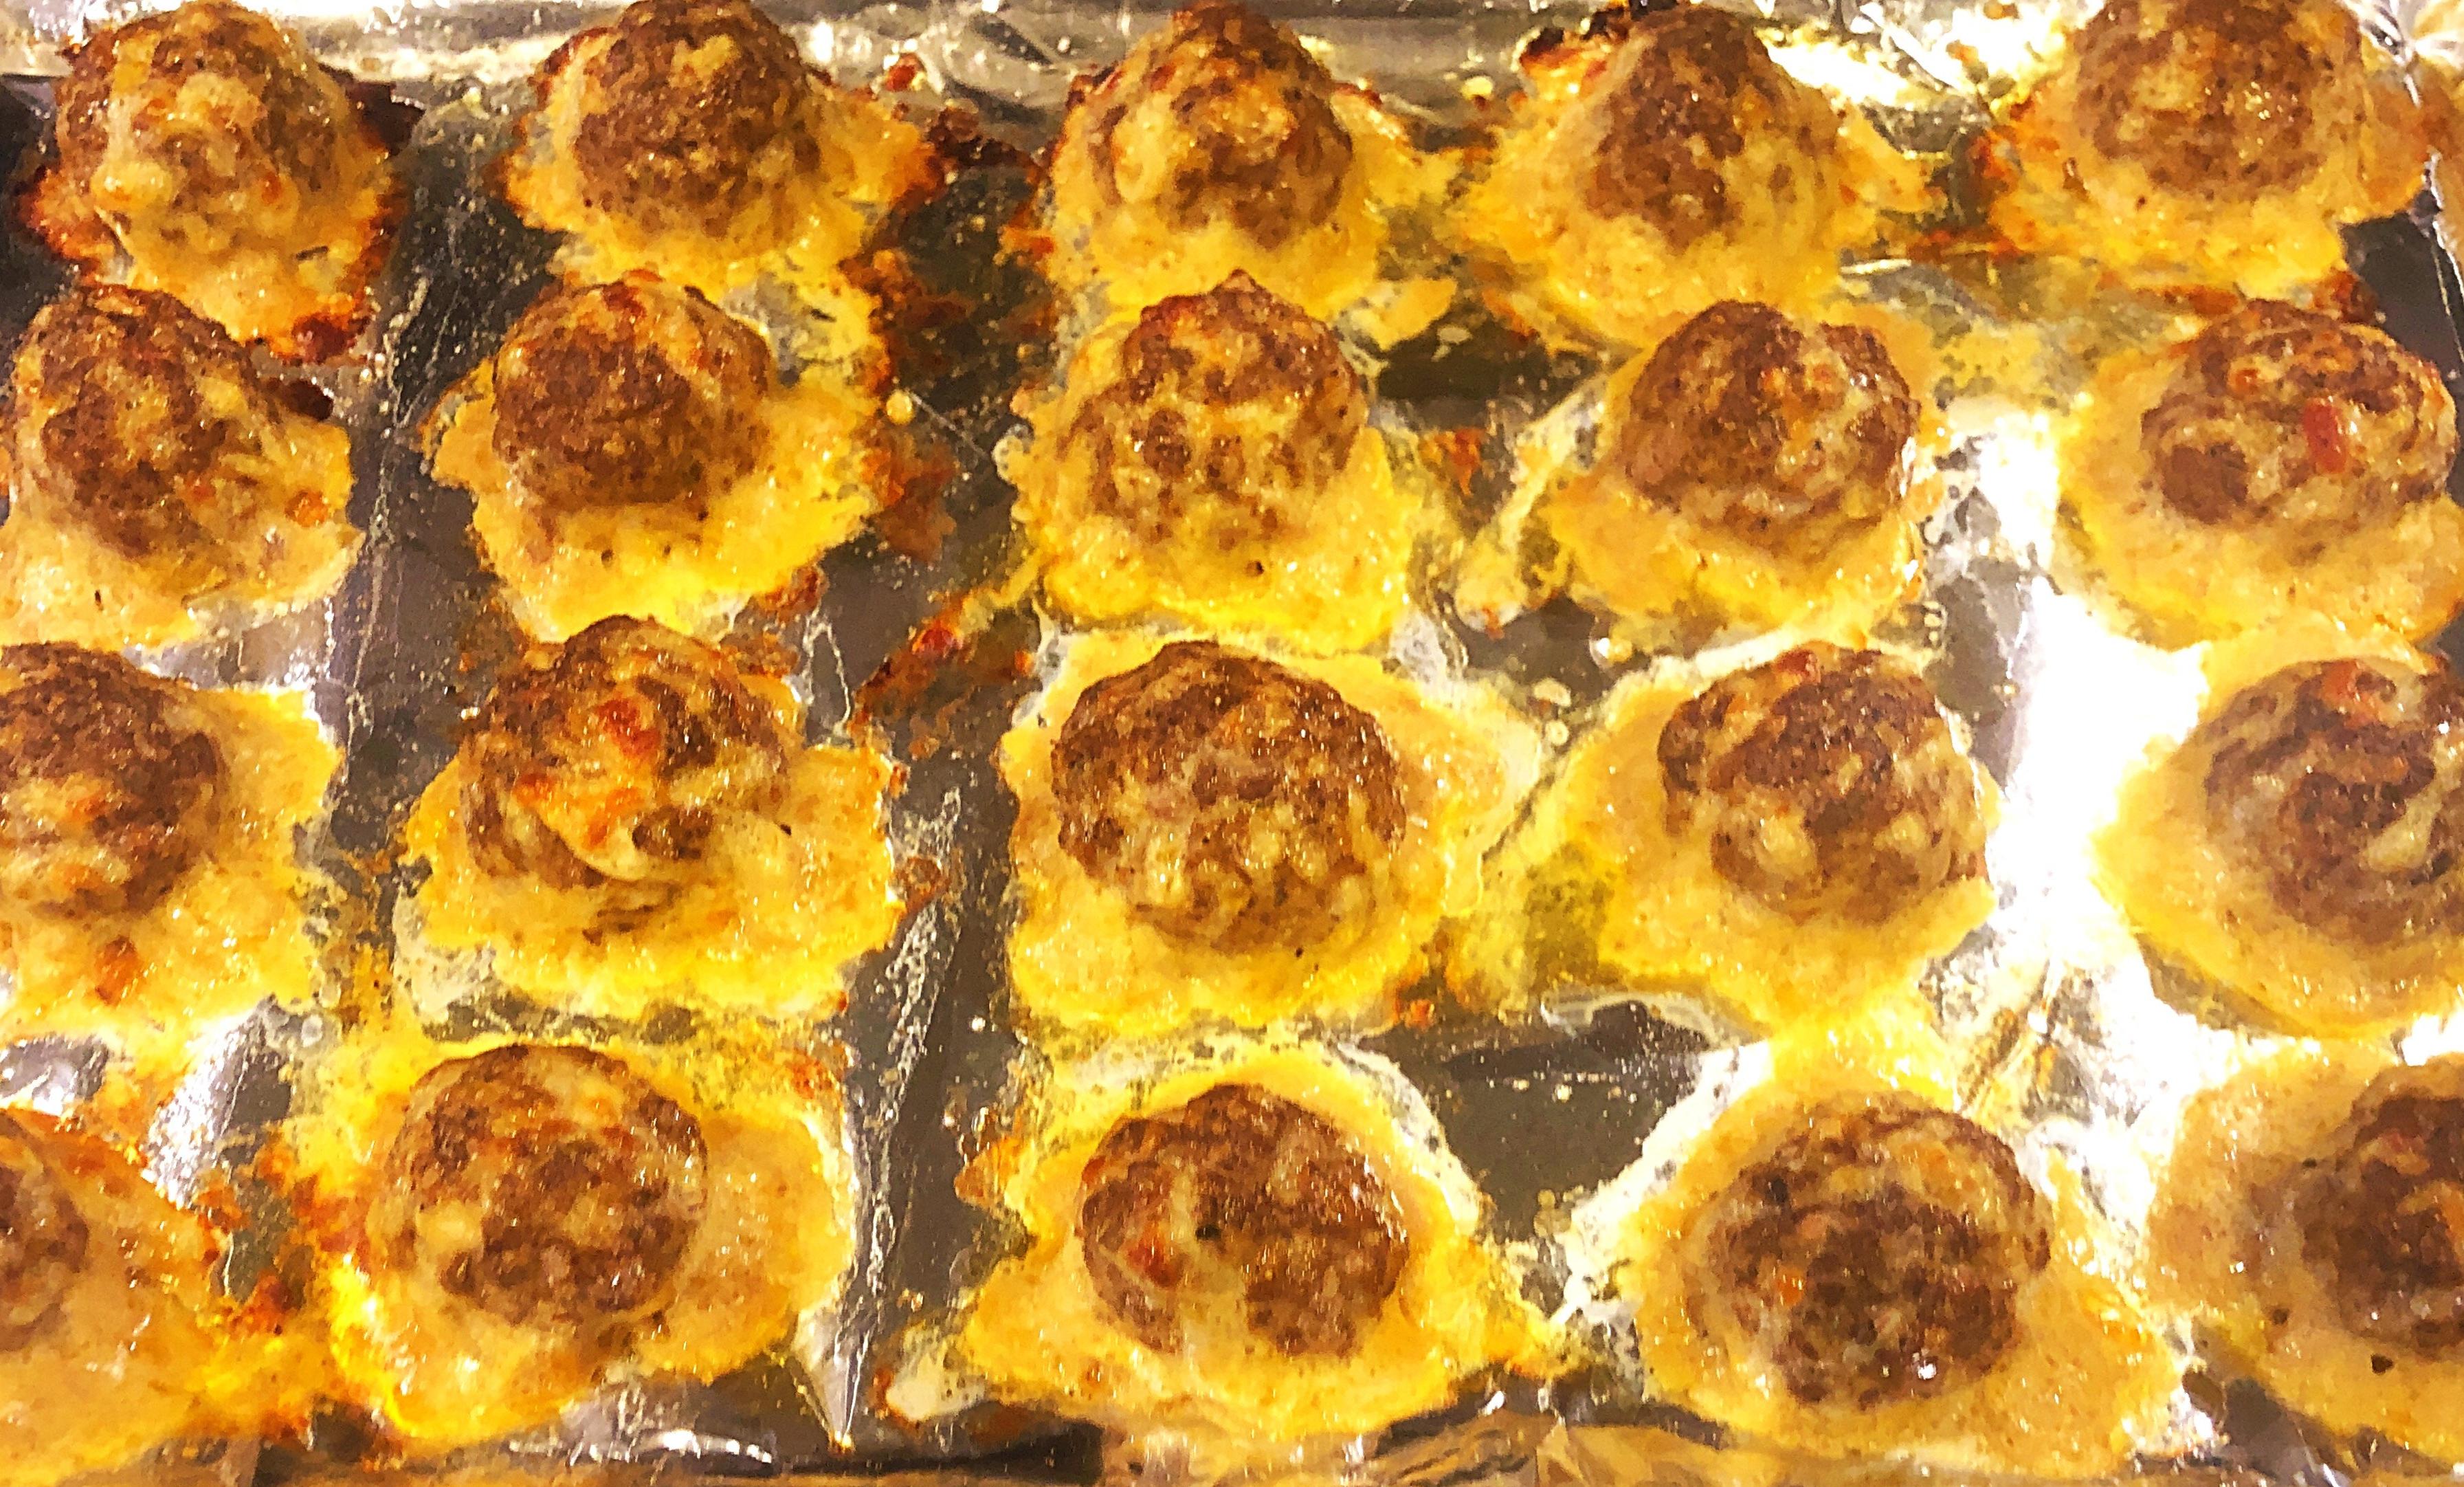 cheery and charming_keto_italian stuffed meatballs recipe 1